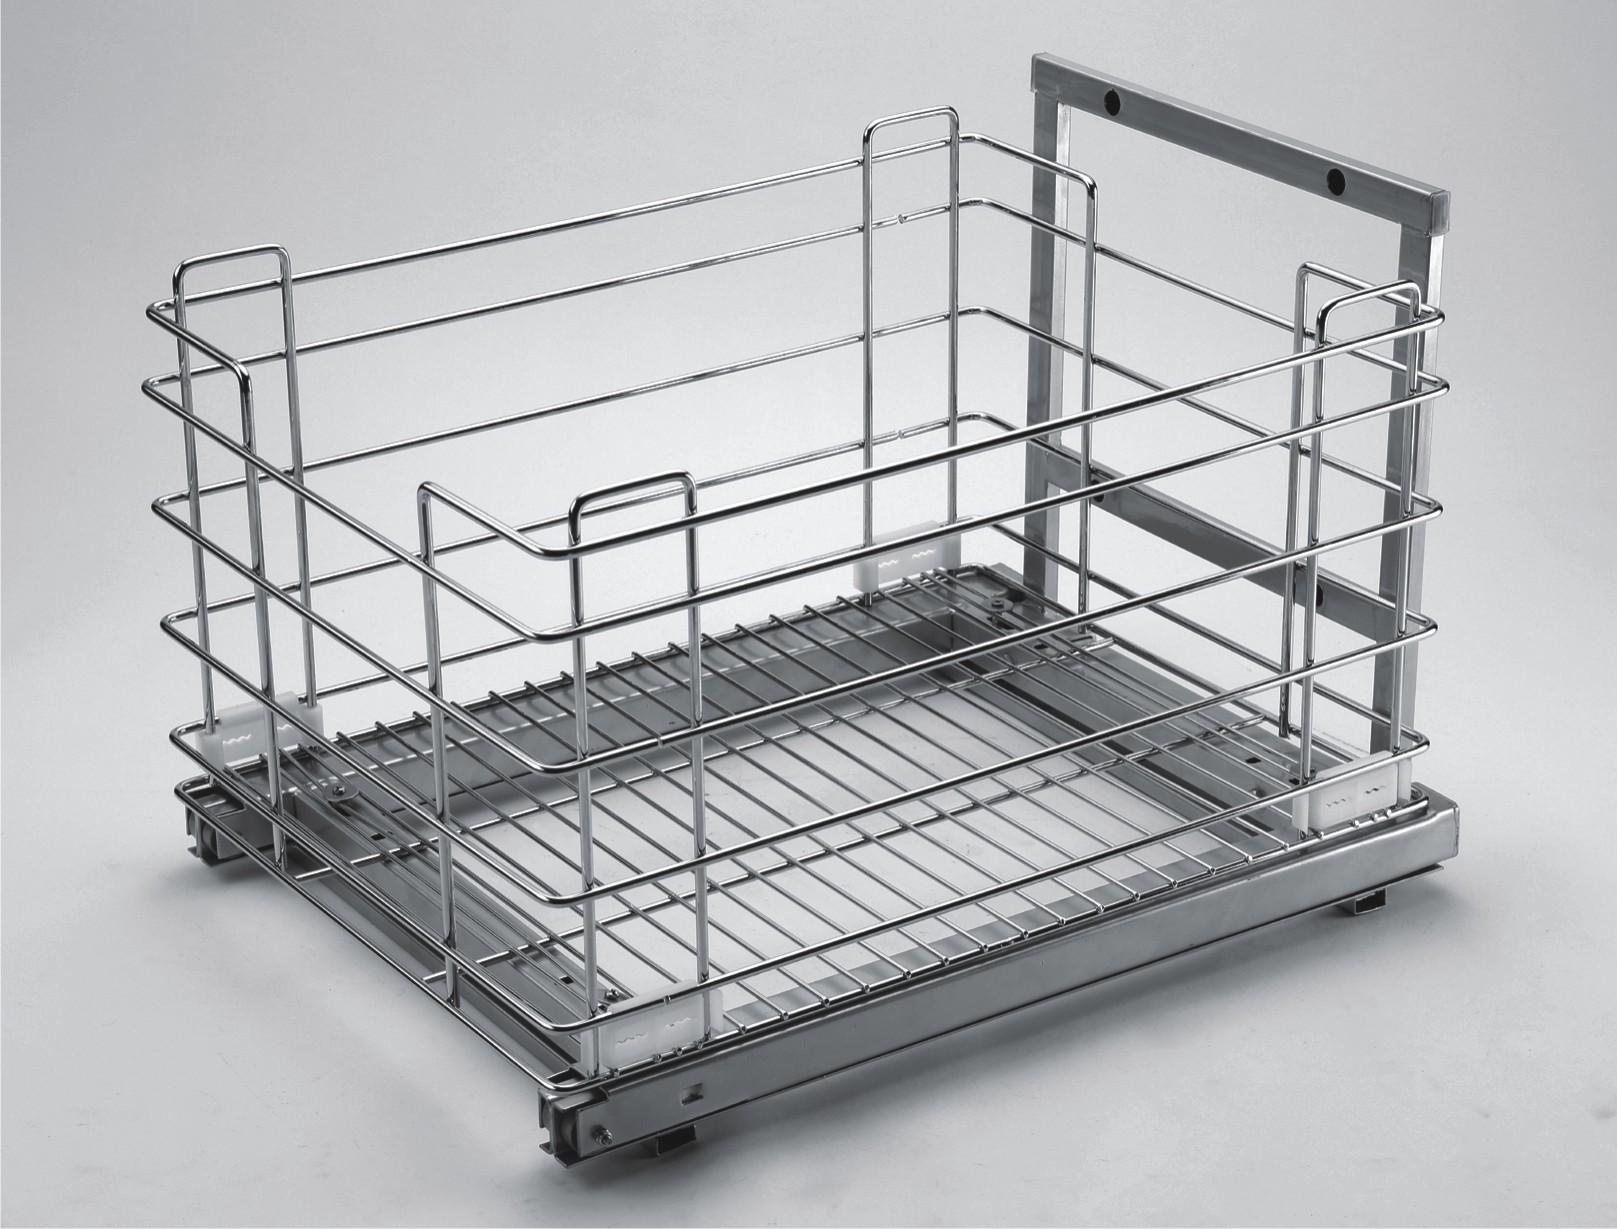 modular kitchen baskets designs. Modular Kitchen Accessories for India Peacock Revera